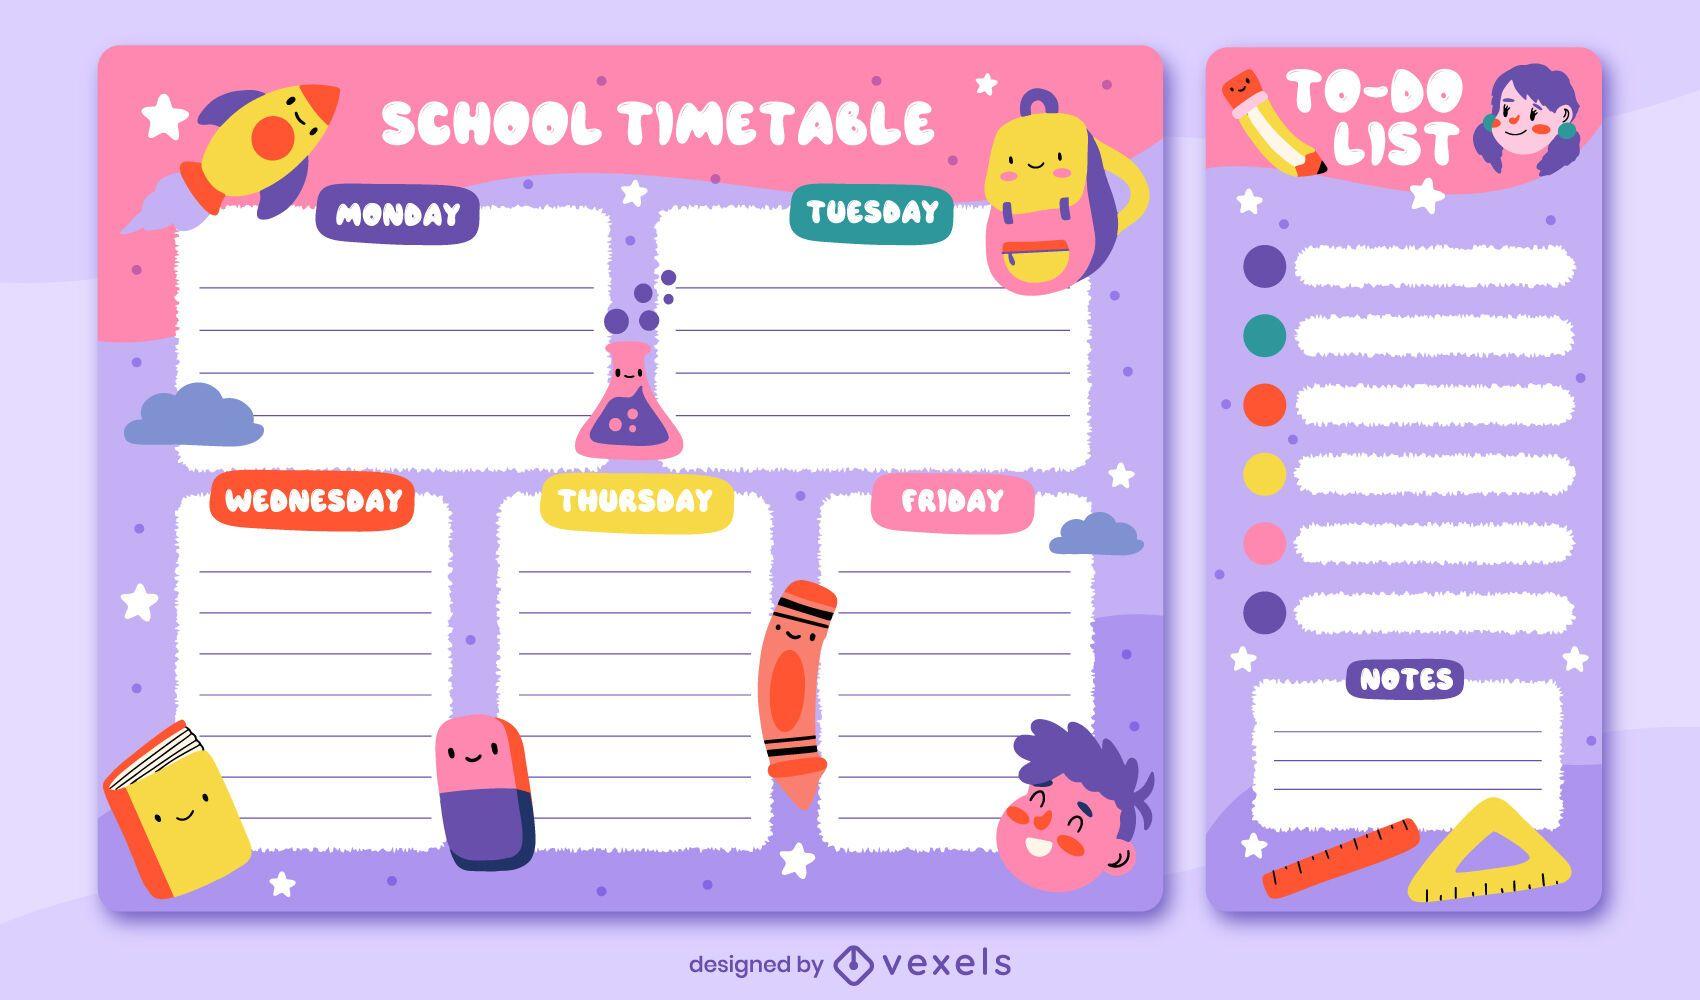 School timetable weekly planner design